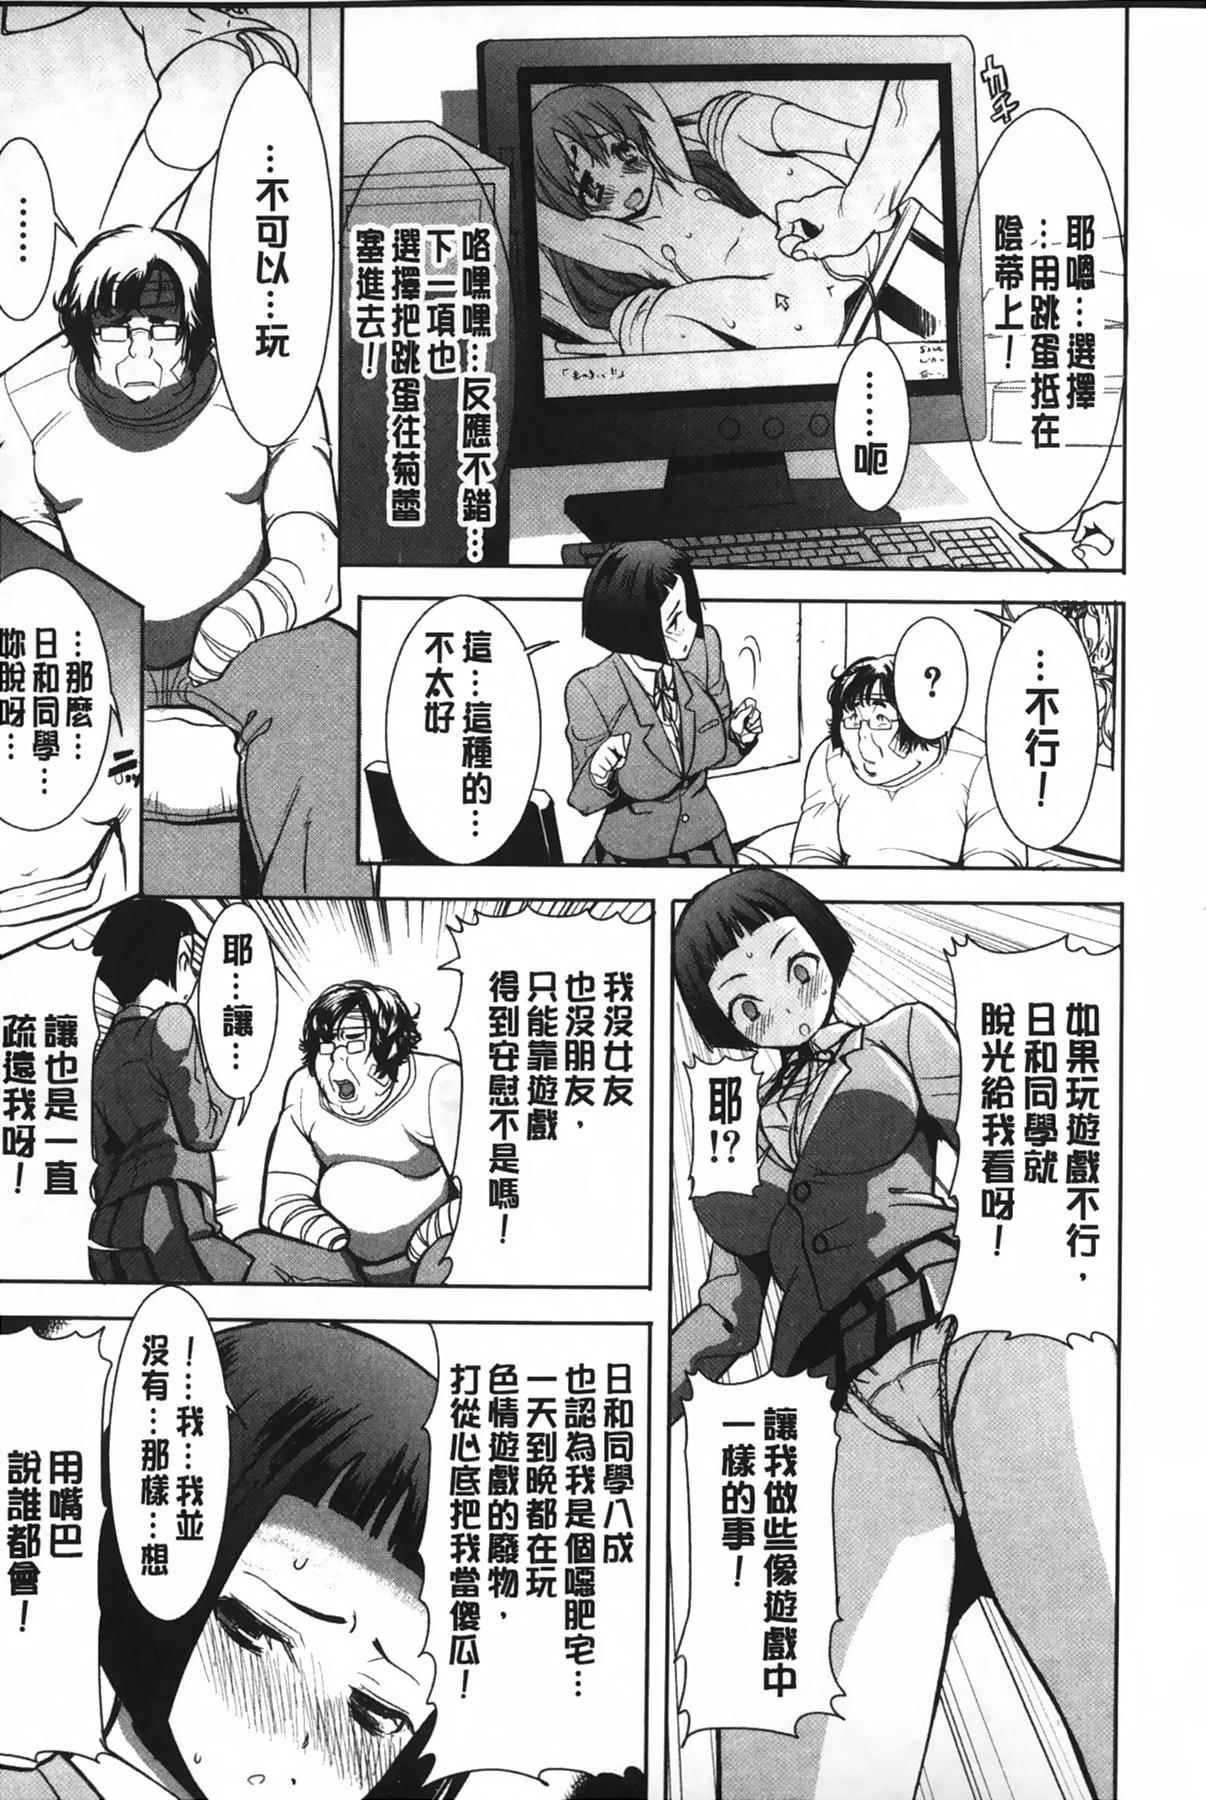 Ane Unsweet - Mihiragi Hiyori + | 姊姊不甜美 彌平木日和+ 17